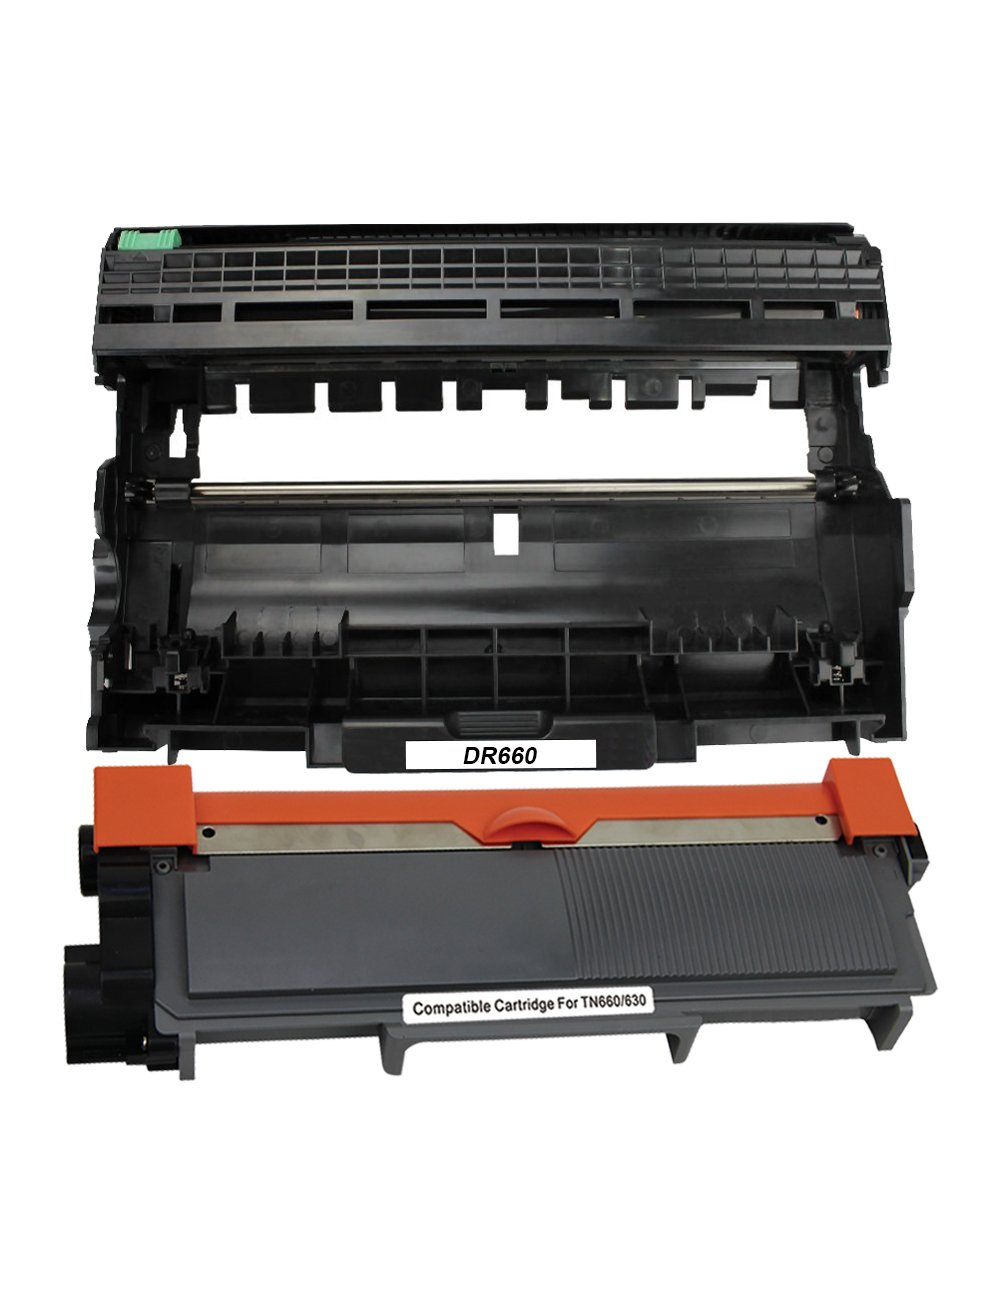 1 DR630 Toner Drum for Brother MFC-L2700DW MFC-L2740DW DR660 Printer 5 4 TN660